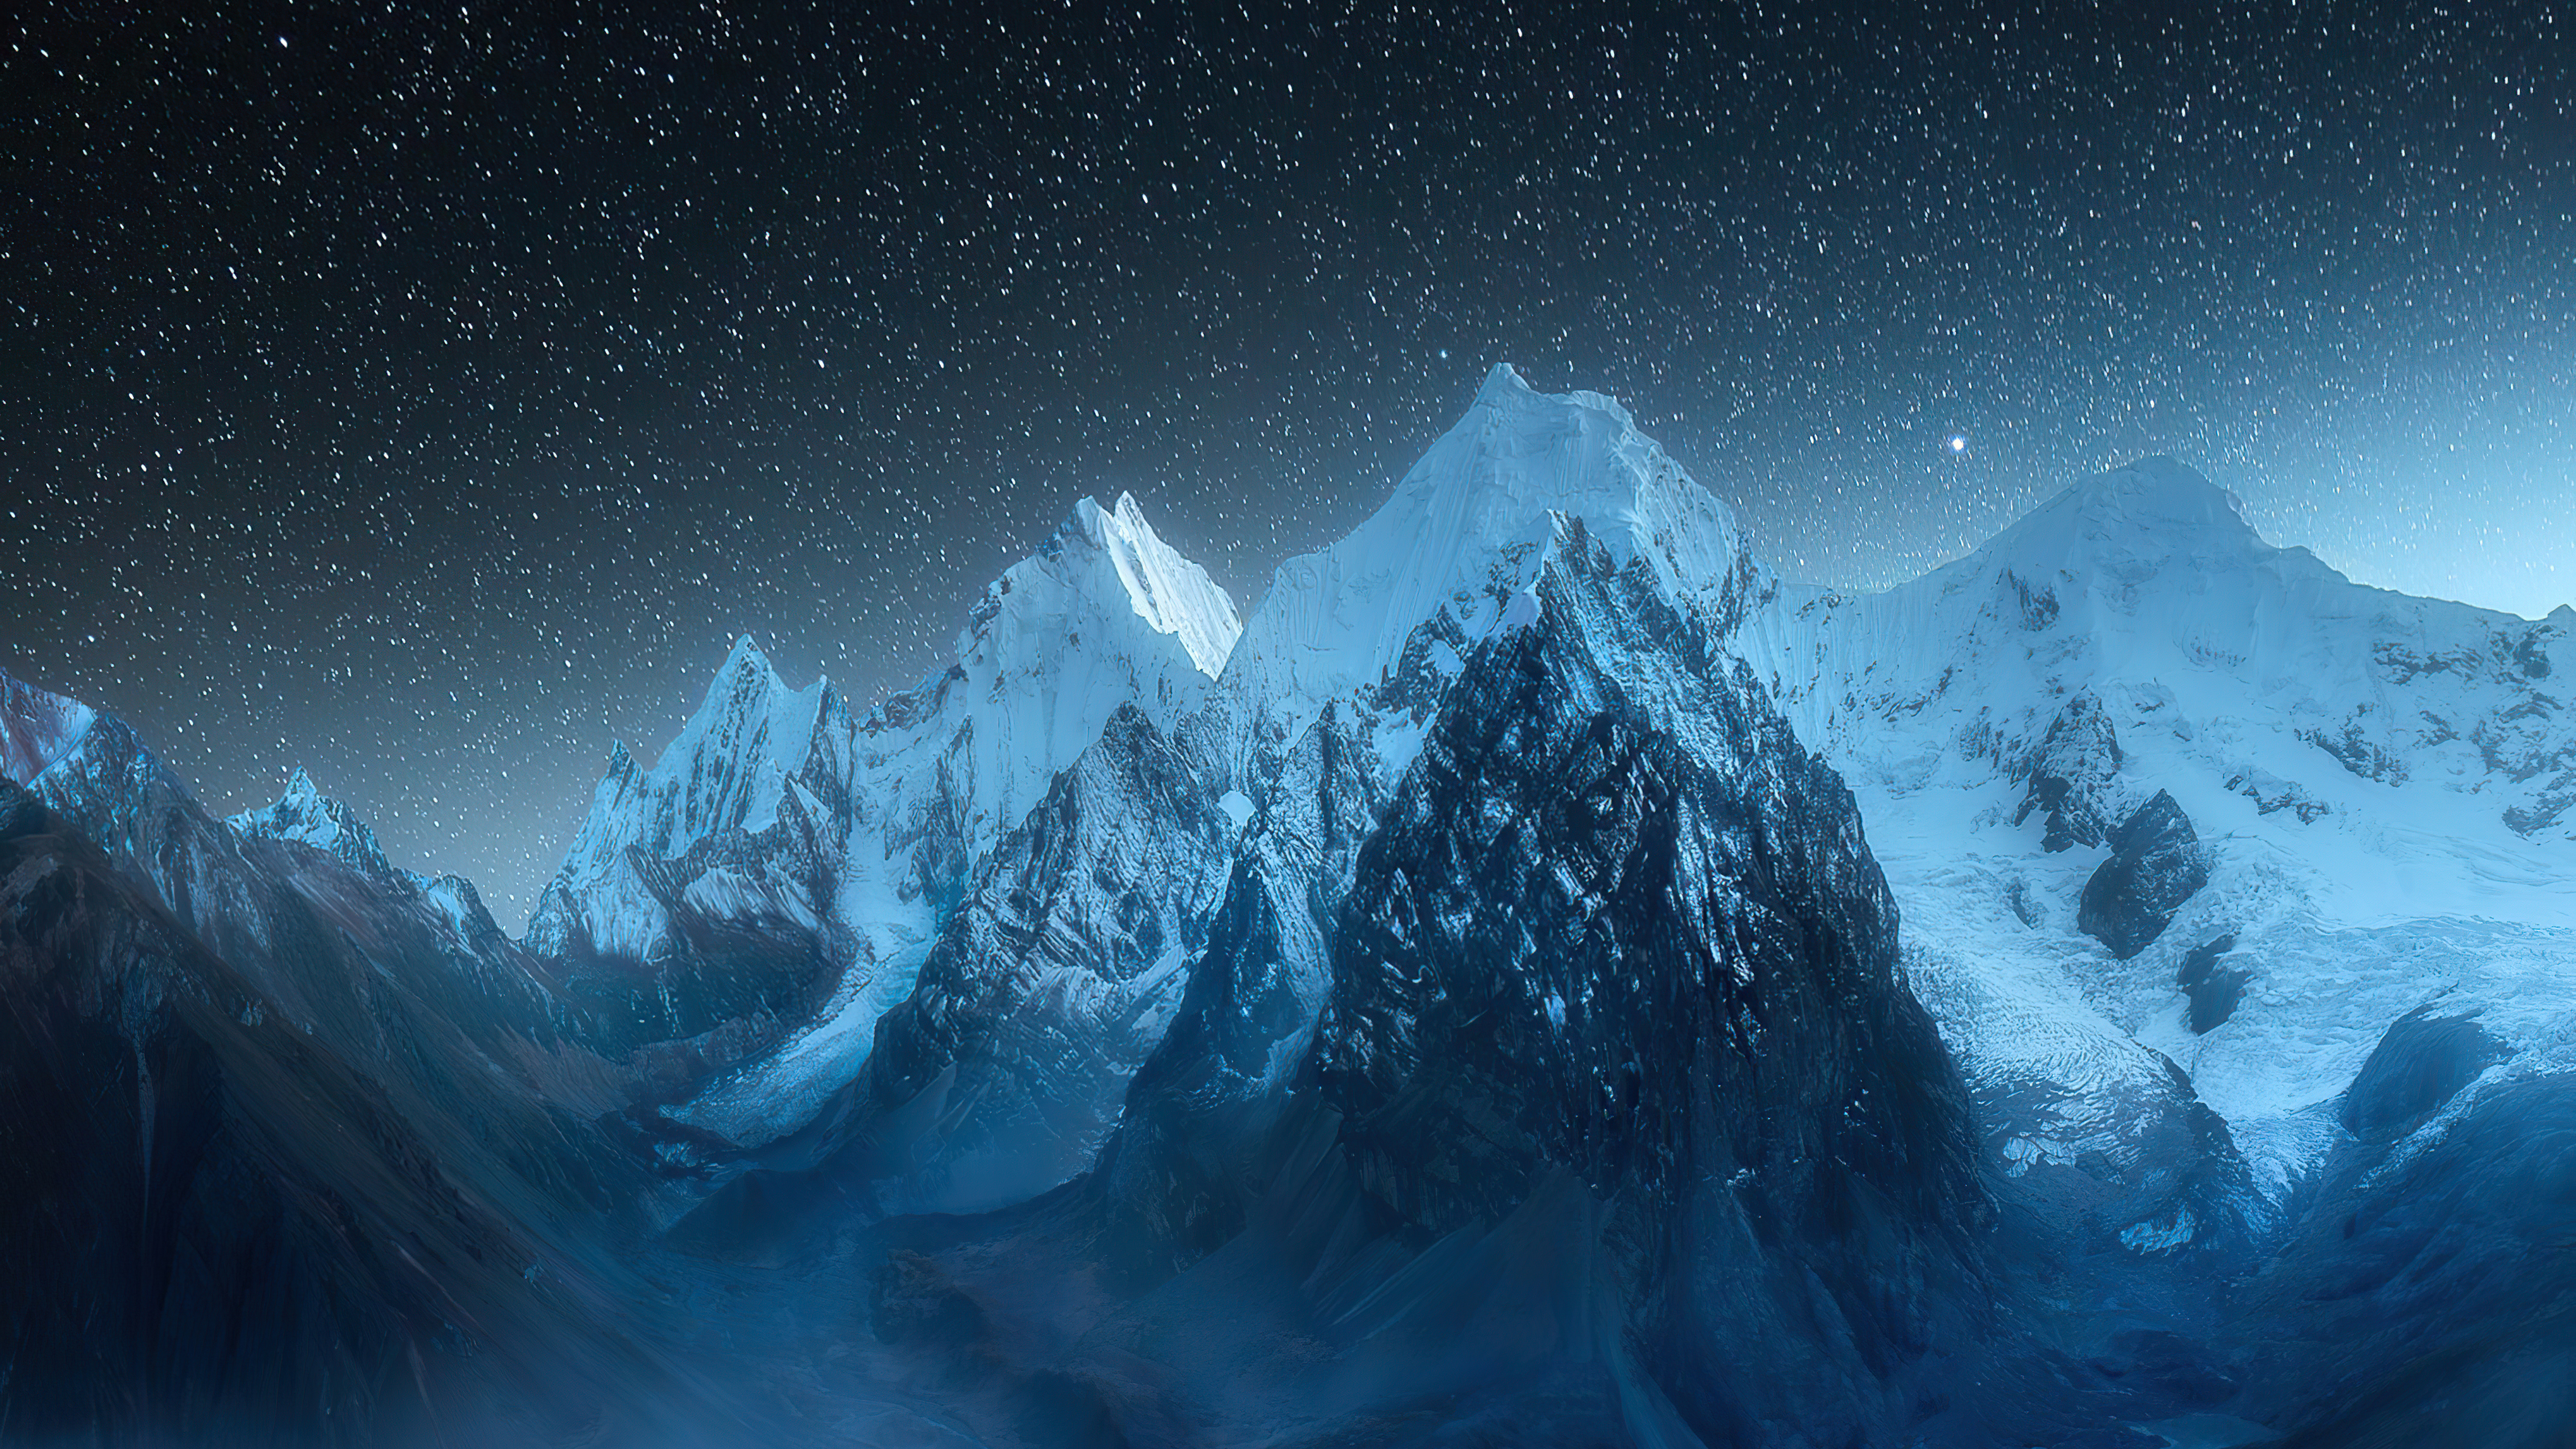 Fondos de pantalla Cordillera Huayhuash en Peru